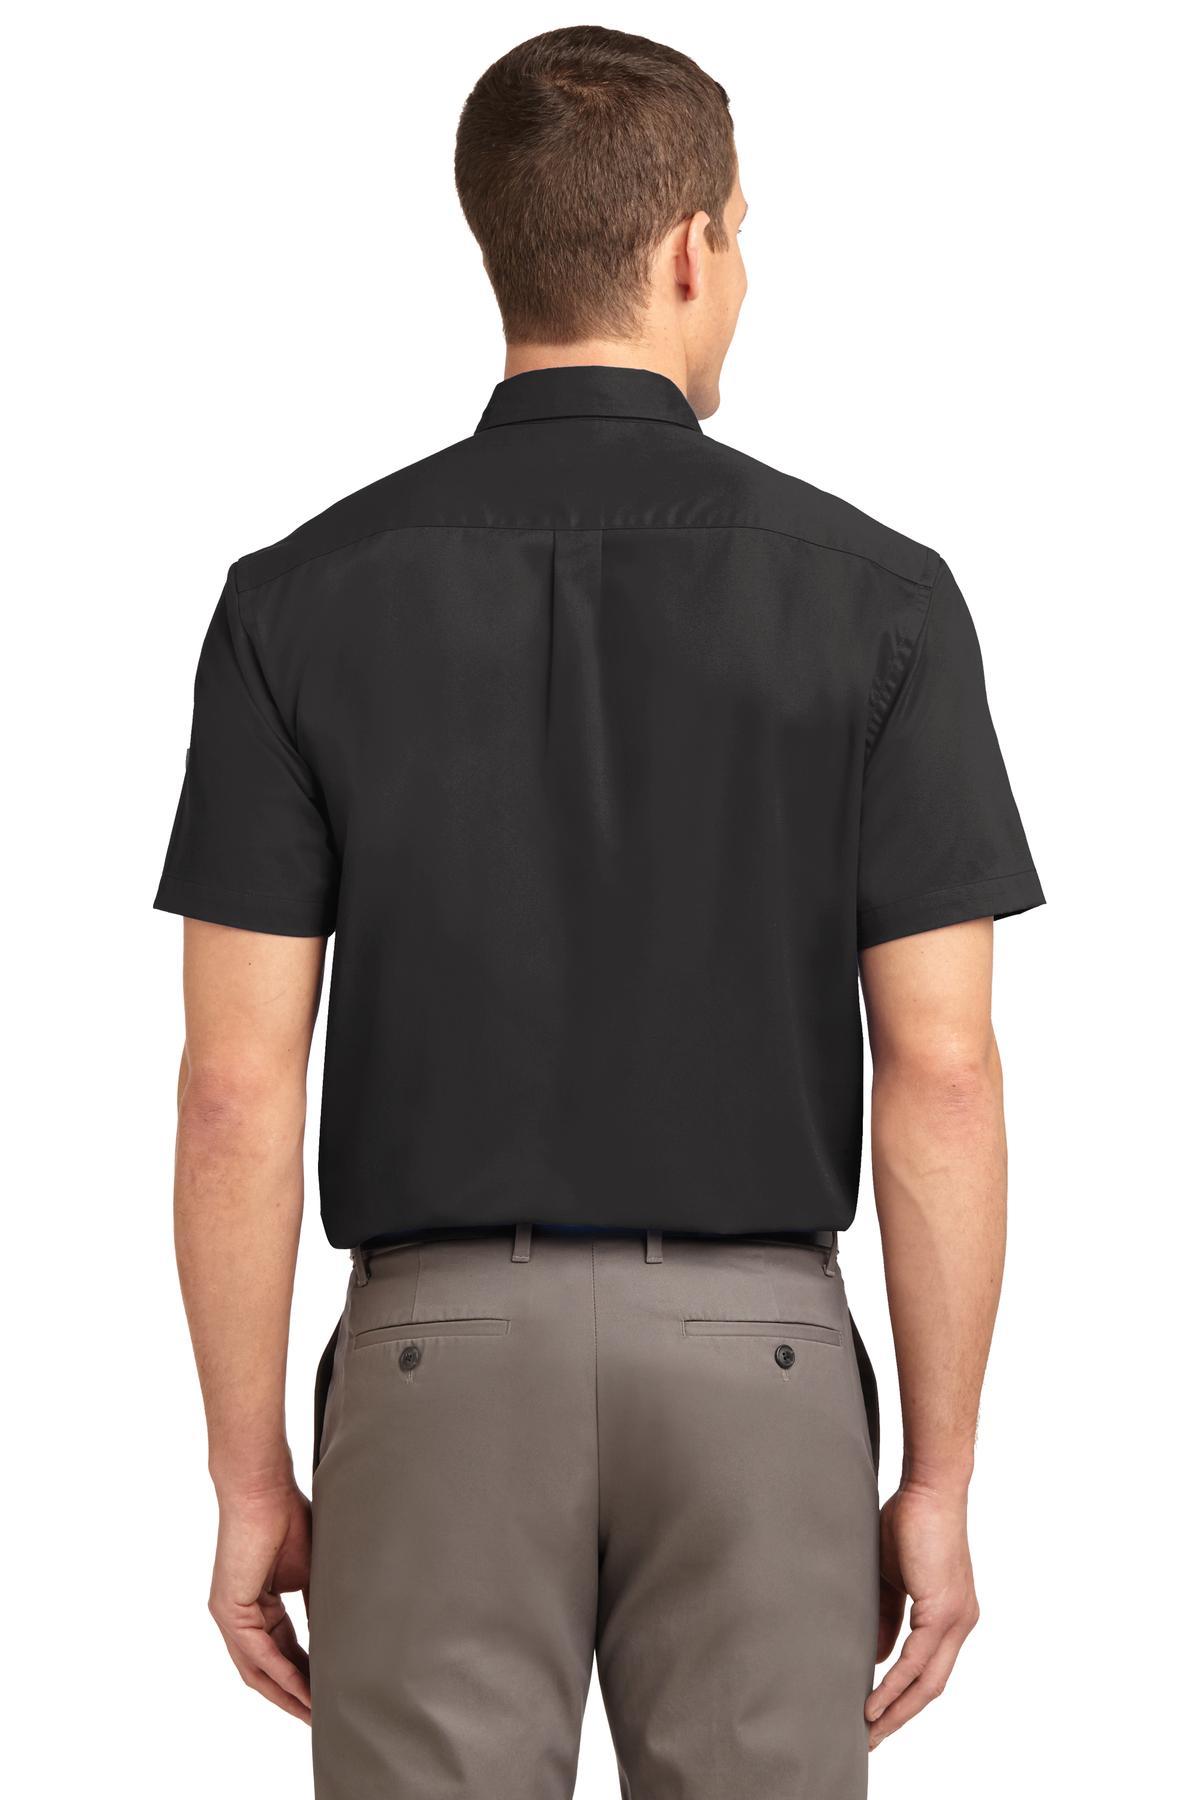 Port Authority Maui Blue // Maui Blue -... S508 Short Sleeve Easy Care Shirt